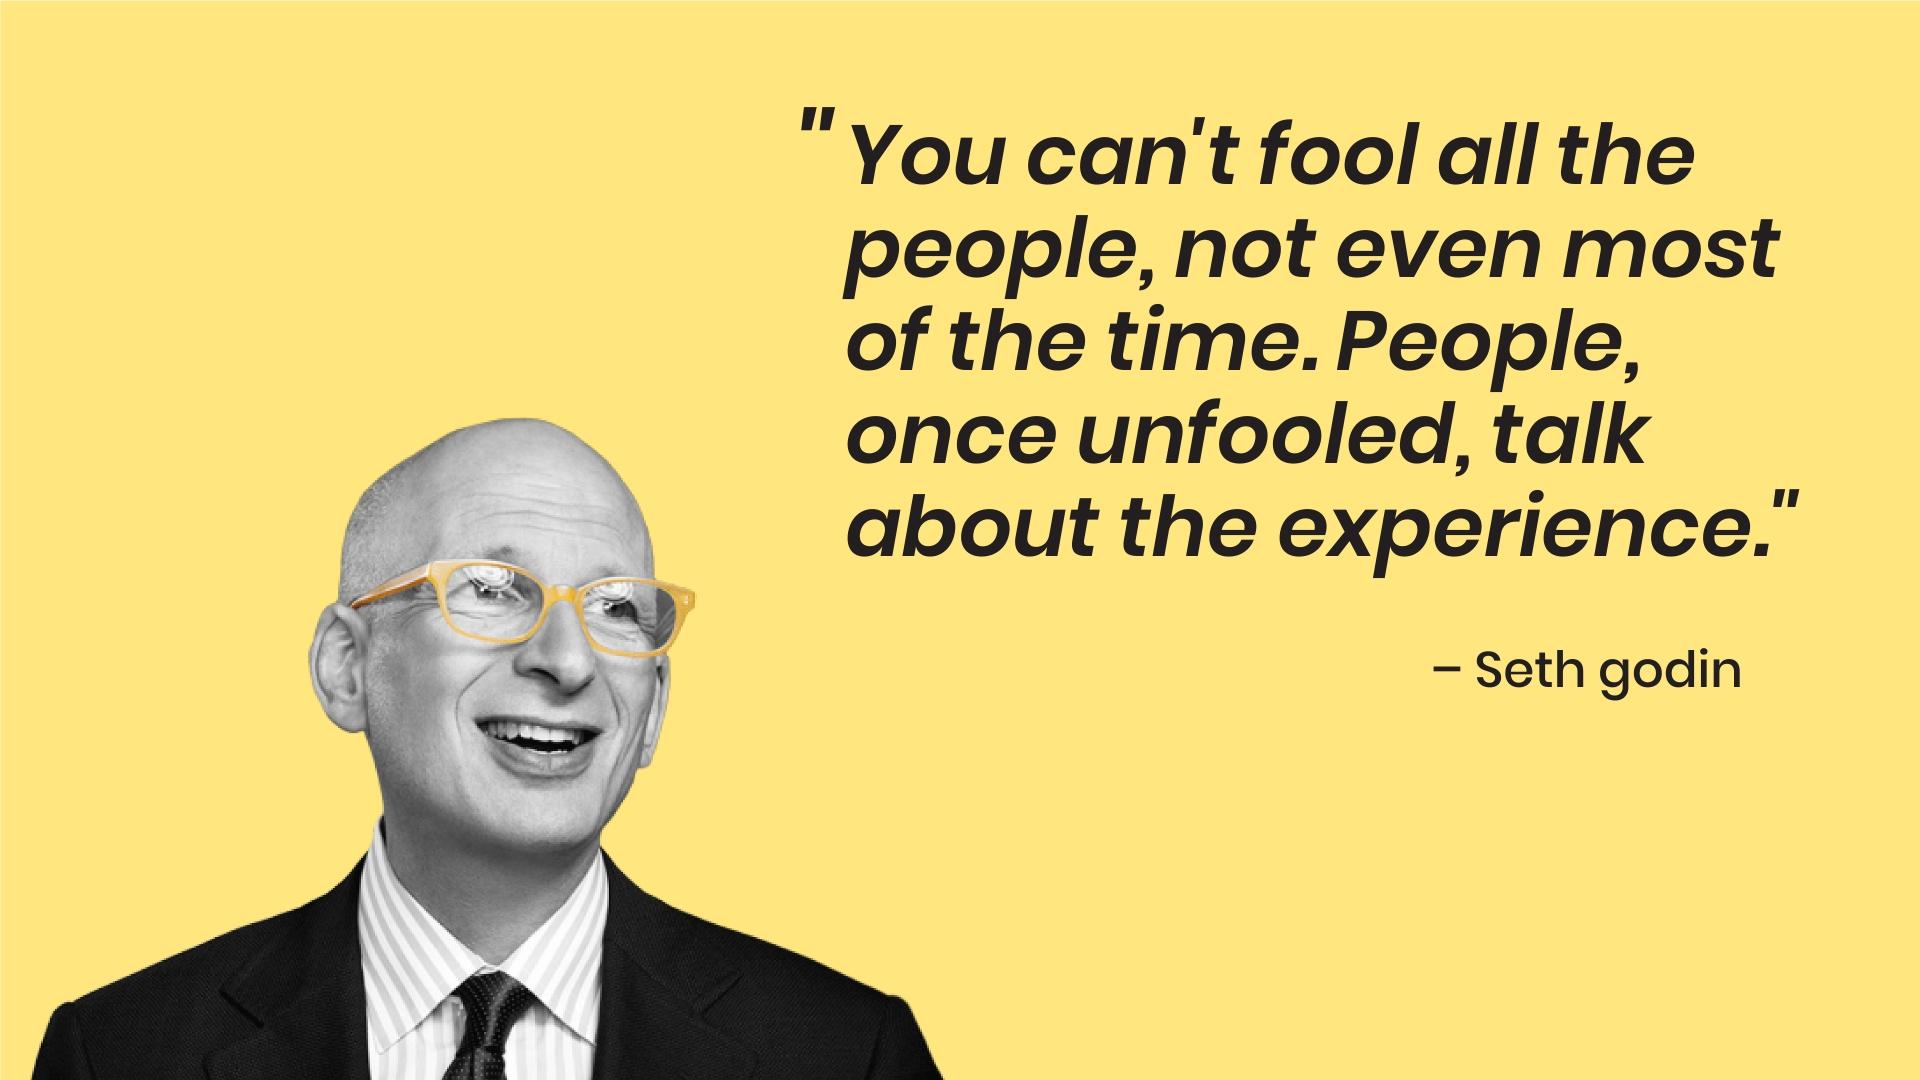 Seth Godin - lead generation inbound marketing